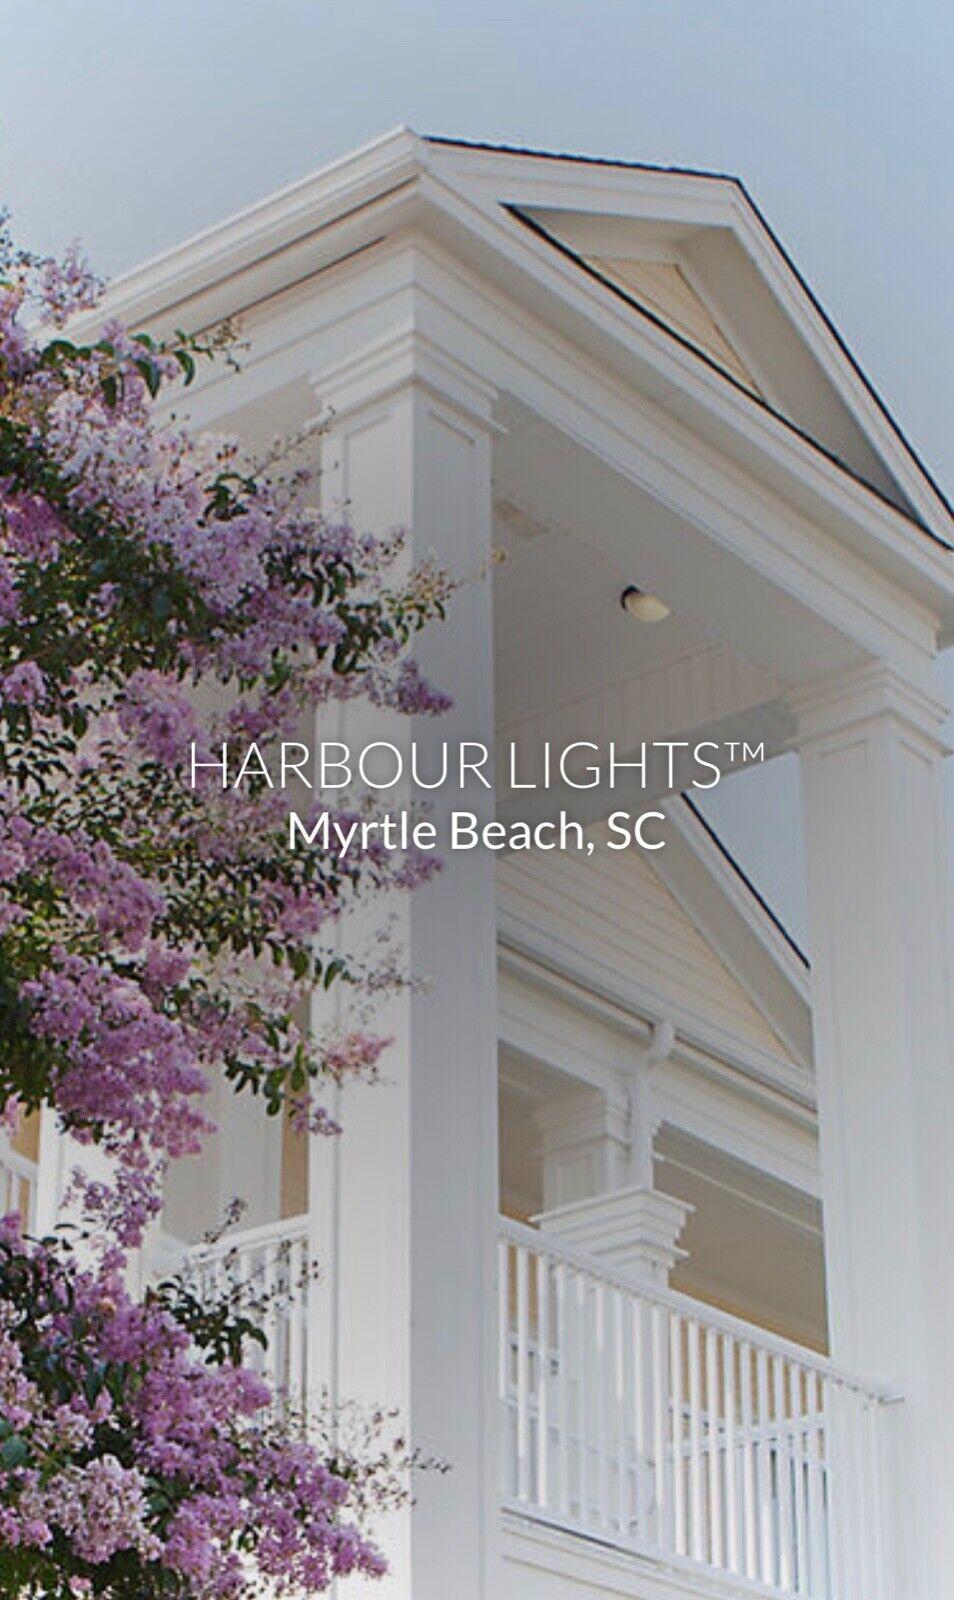 Bluegreen Resorts - Harbour Lights - Myrtle Beach - $1.00